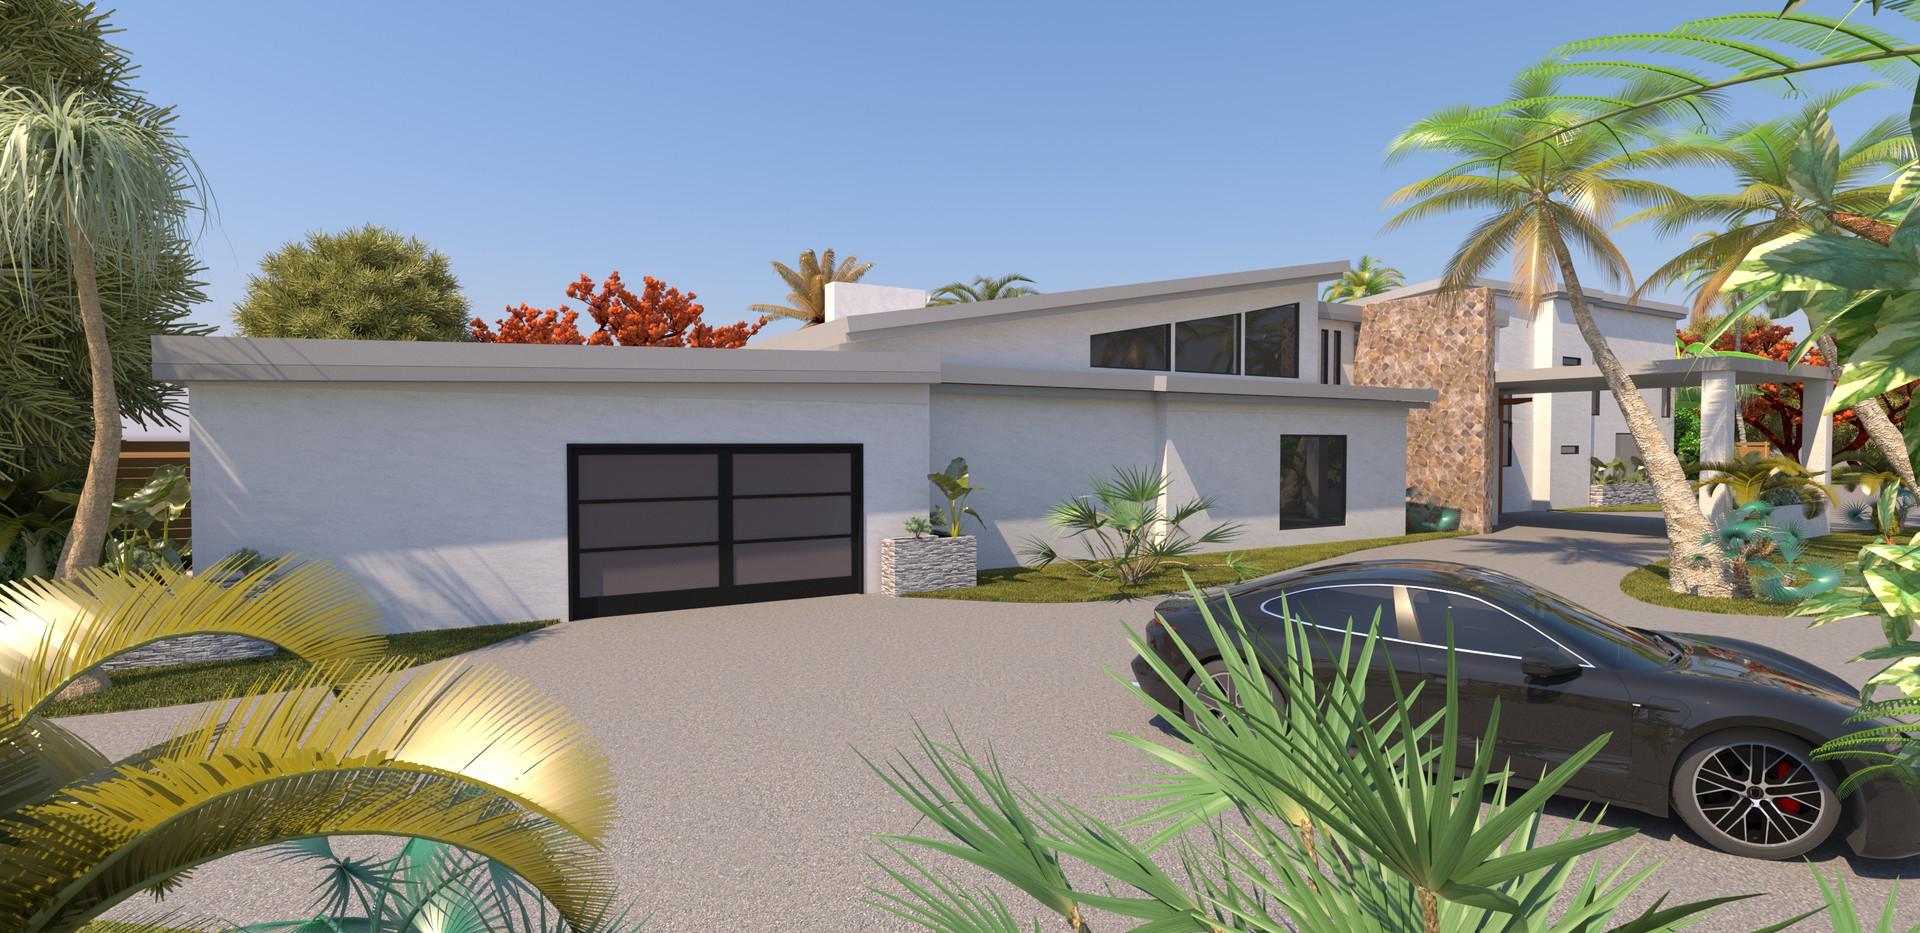 Mansion View 02